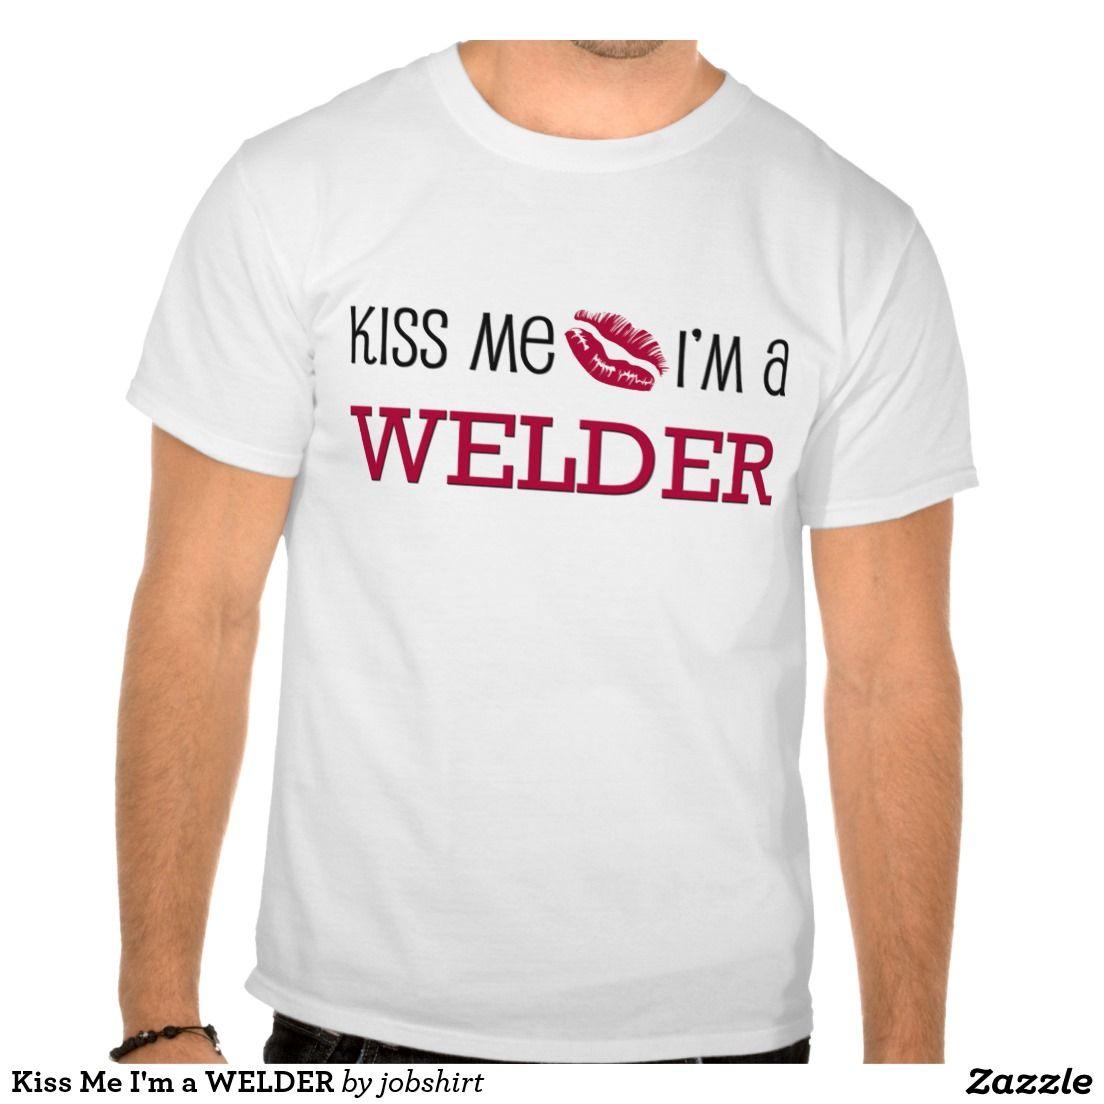 Kiss Me I'm a WELDER Tshirts